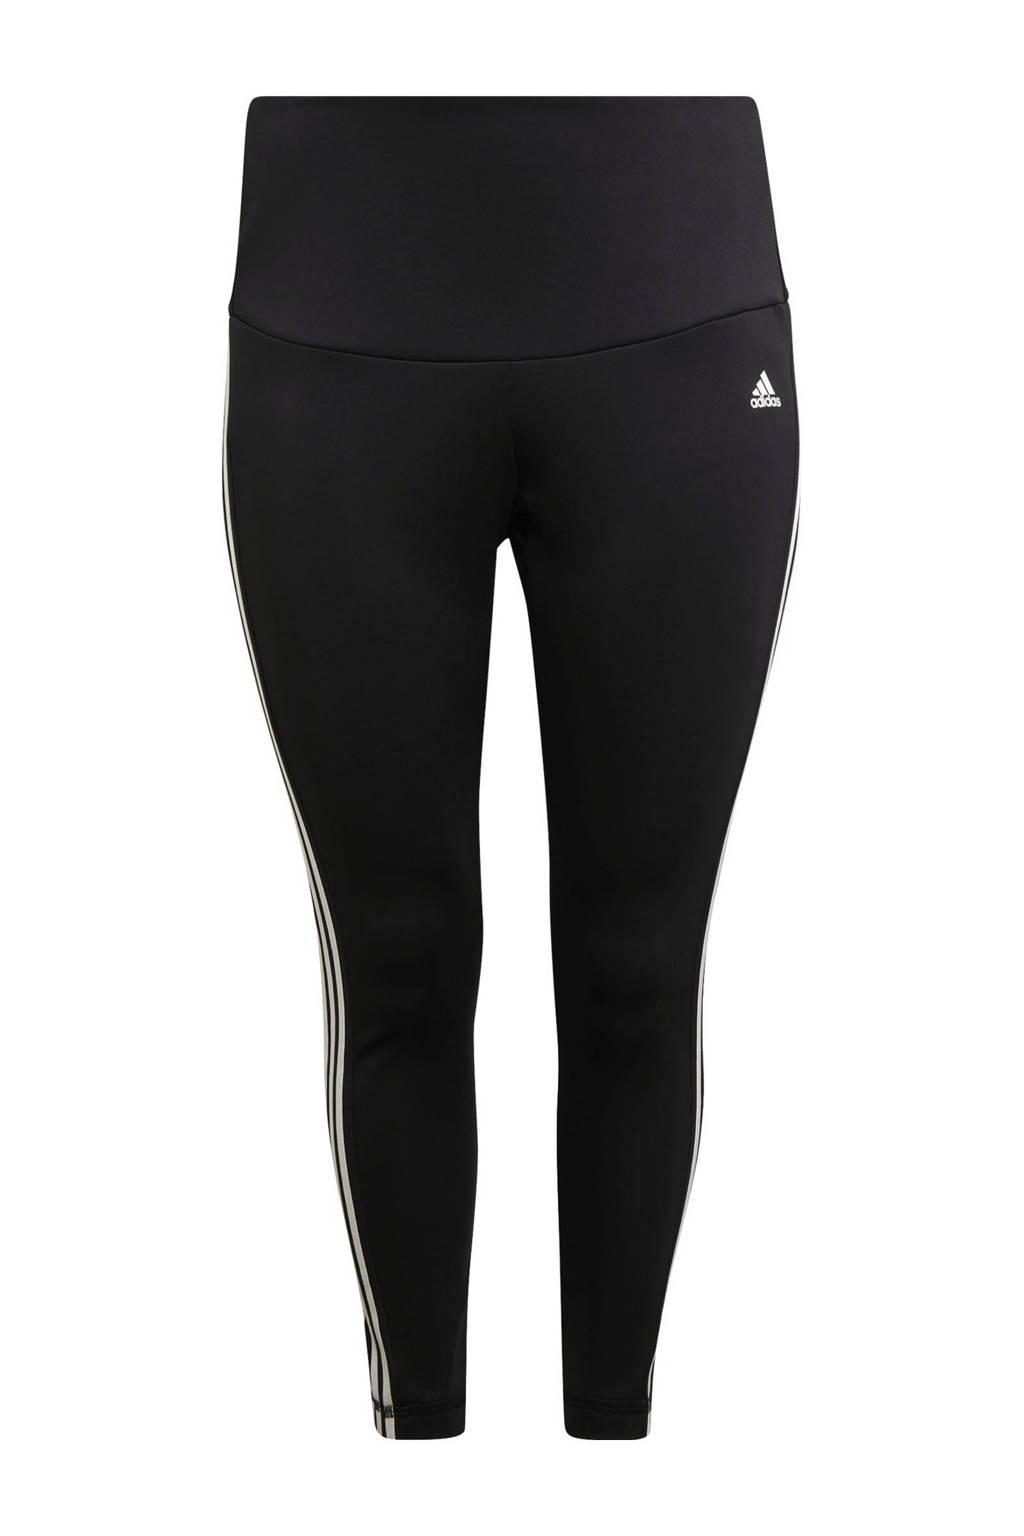 adidas Performance Plus Size 7/8 sportlegging zwart/wit, Zwart/wit